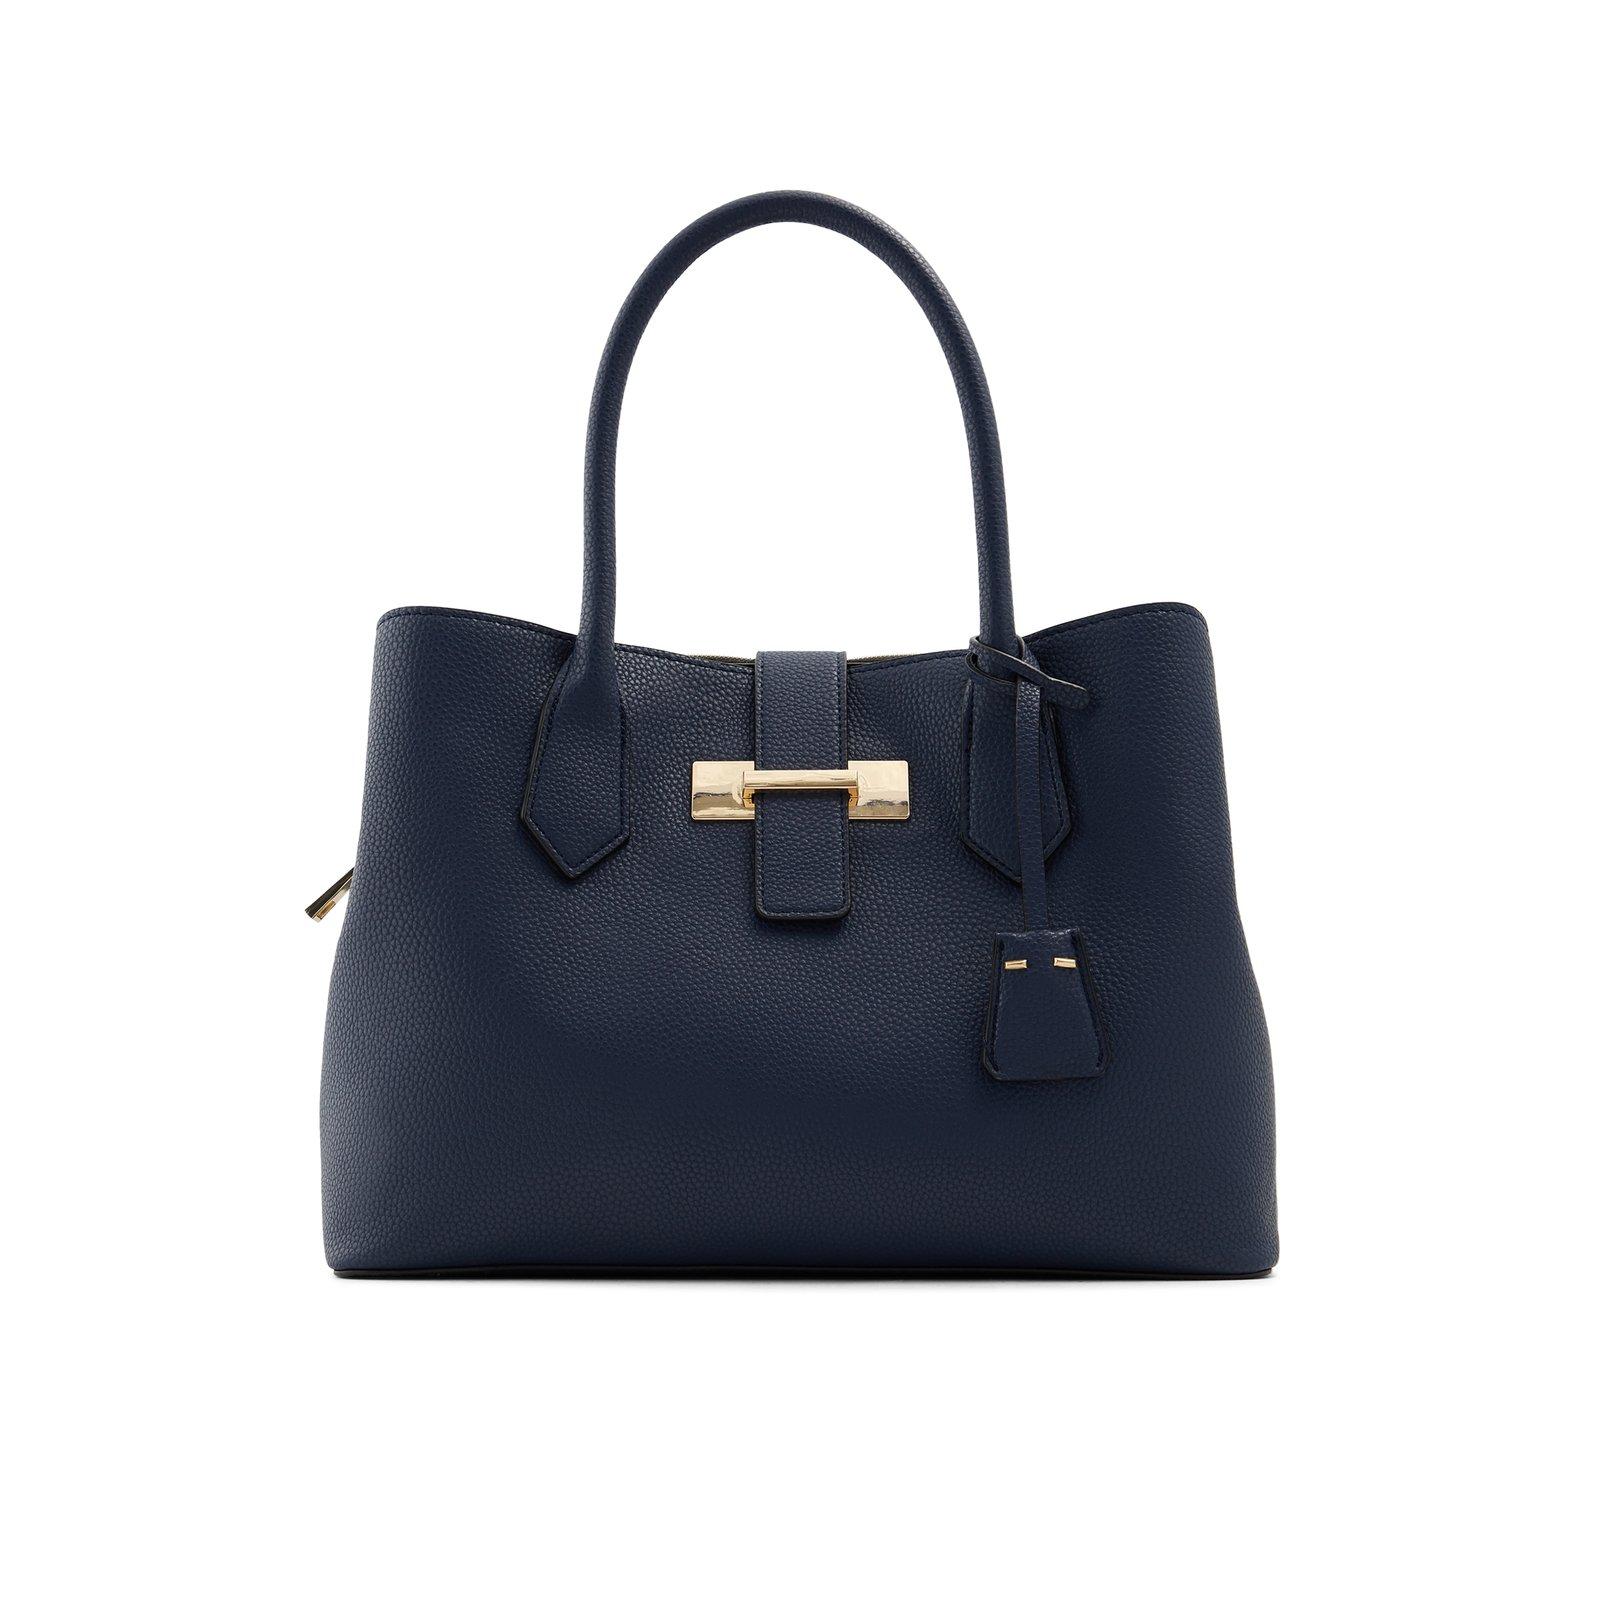 K Studio Wezel - Women's Handbags - Blue photo